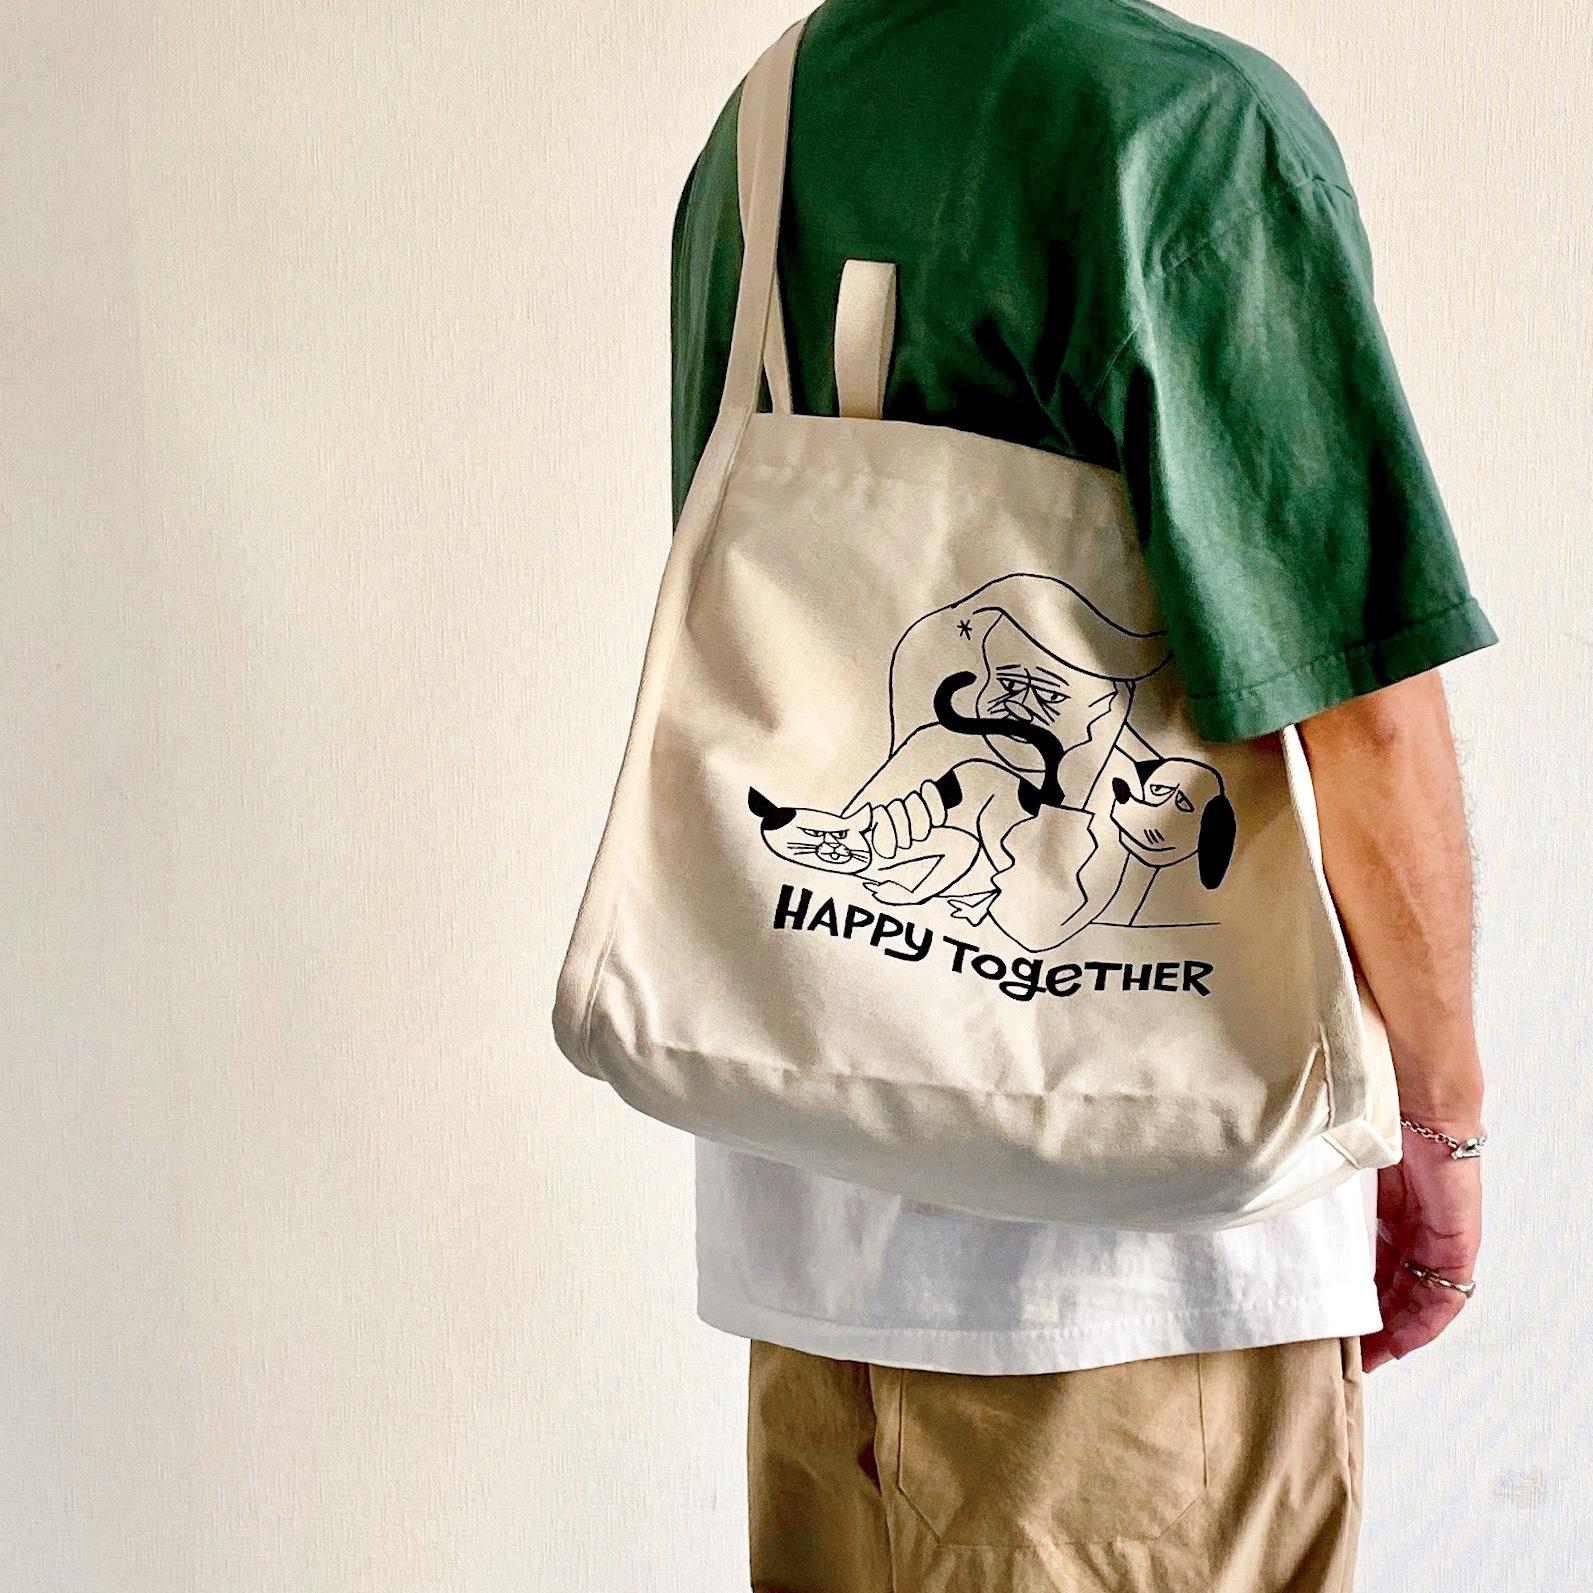 Happy Together project_resident bag  / Yusuke Hanai